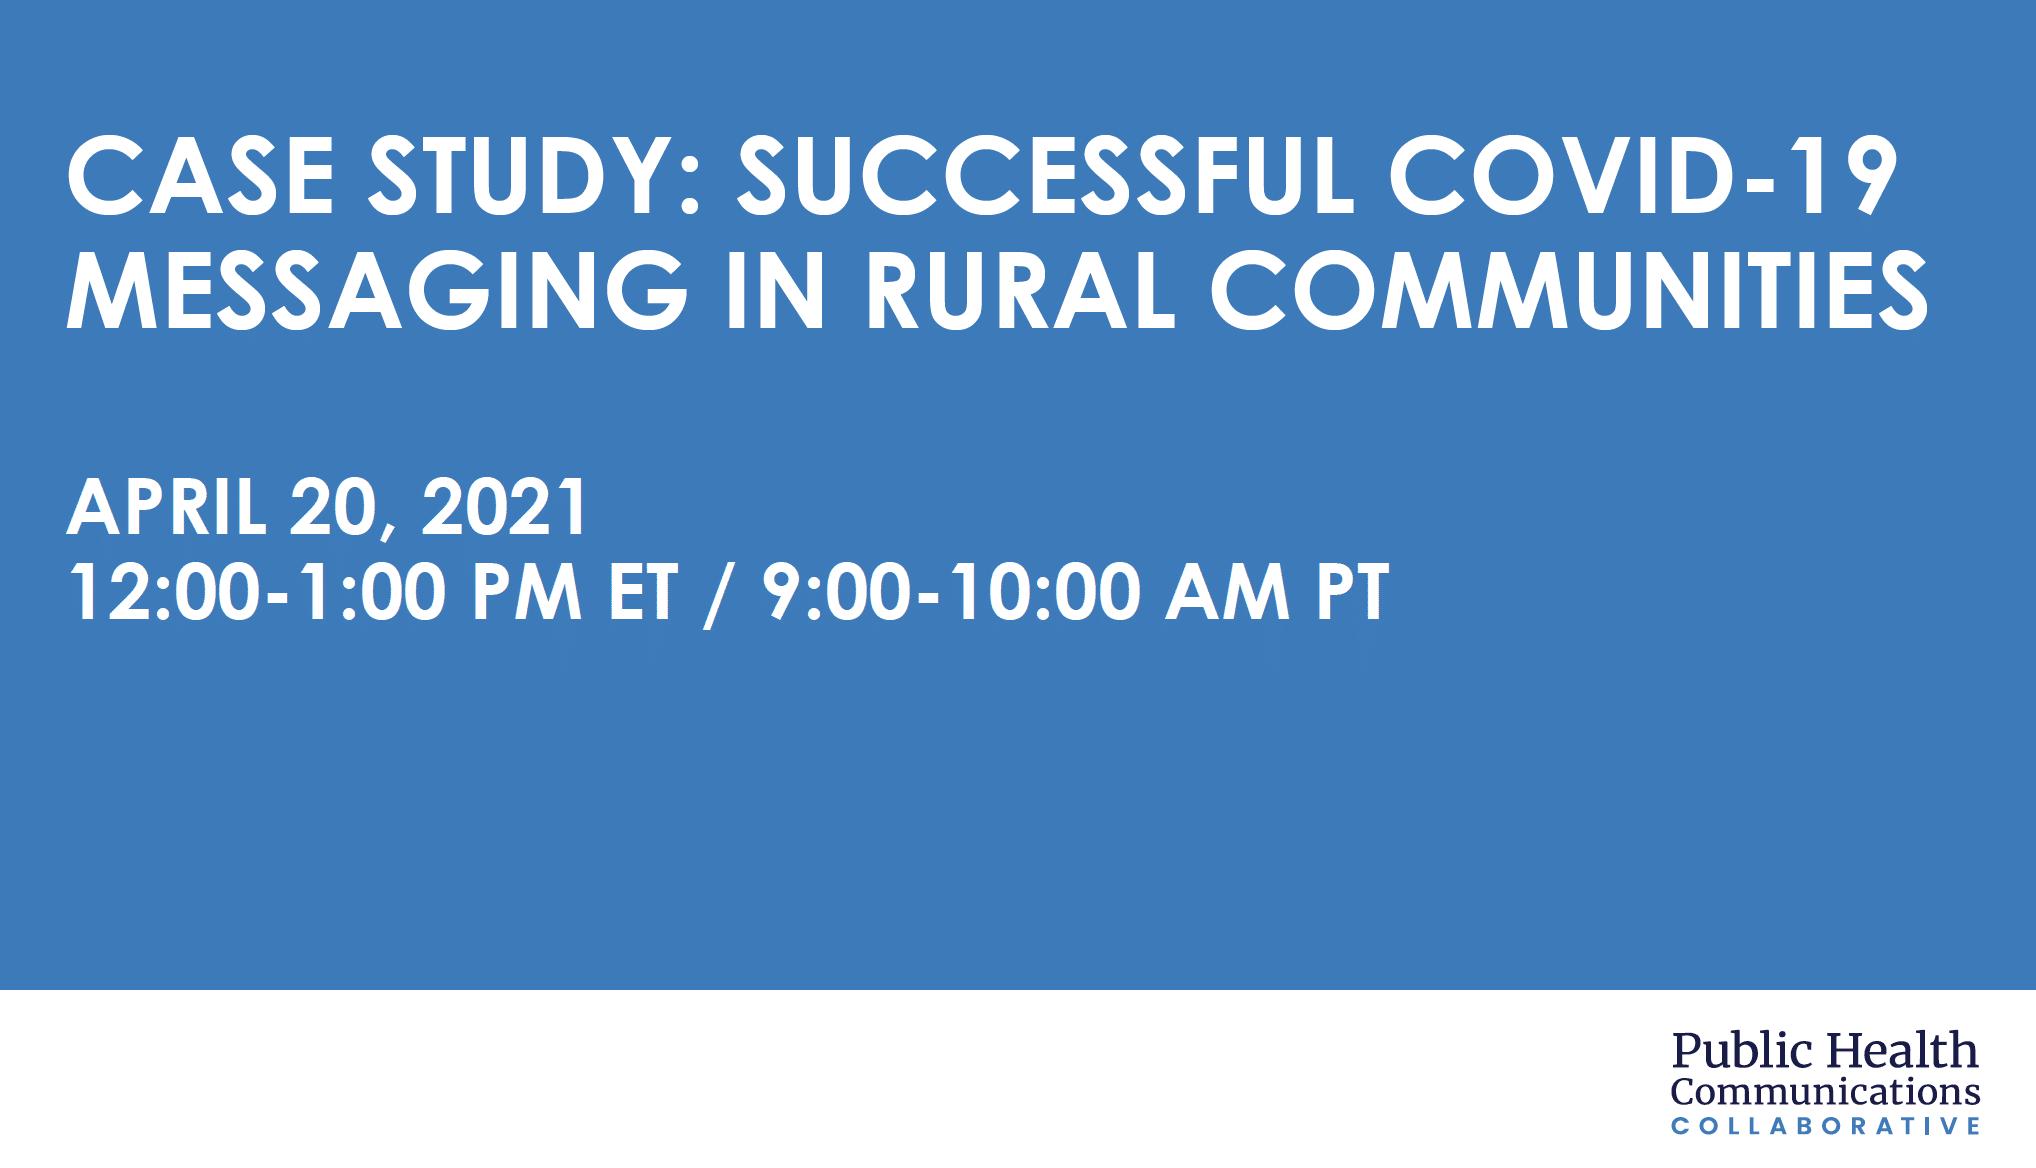 Webinar: Successful COVID-19 Messaging in Rural Communities